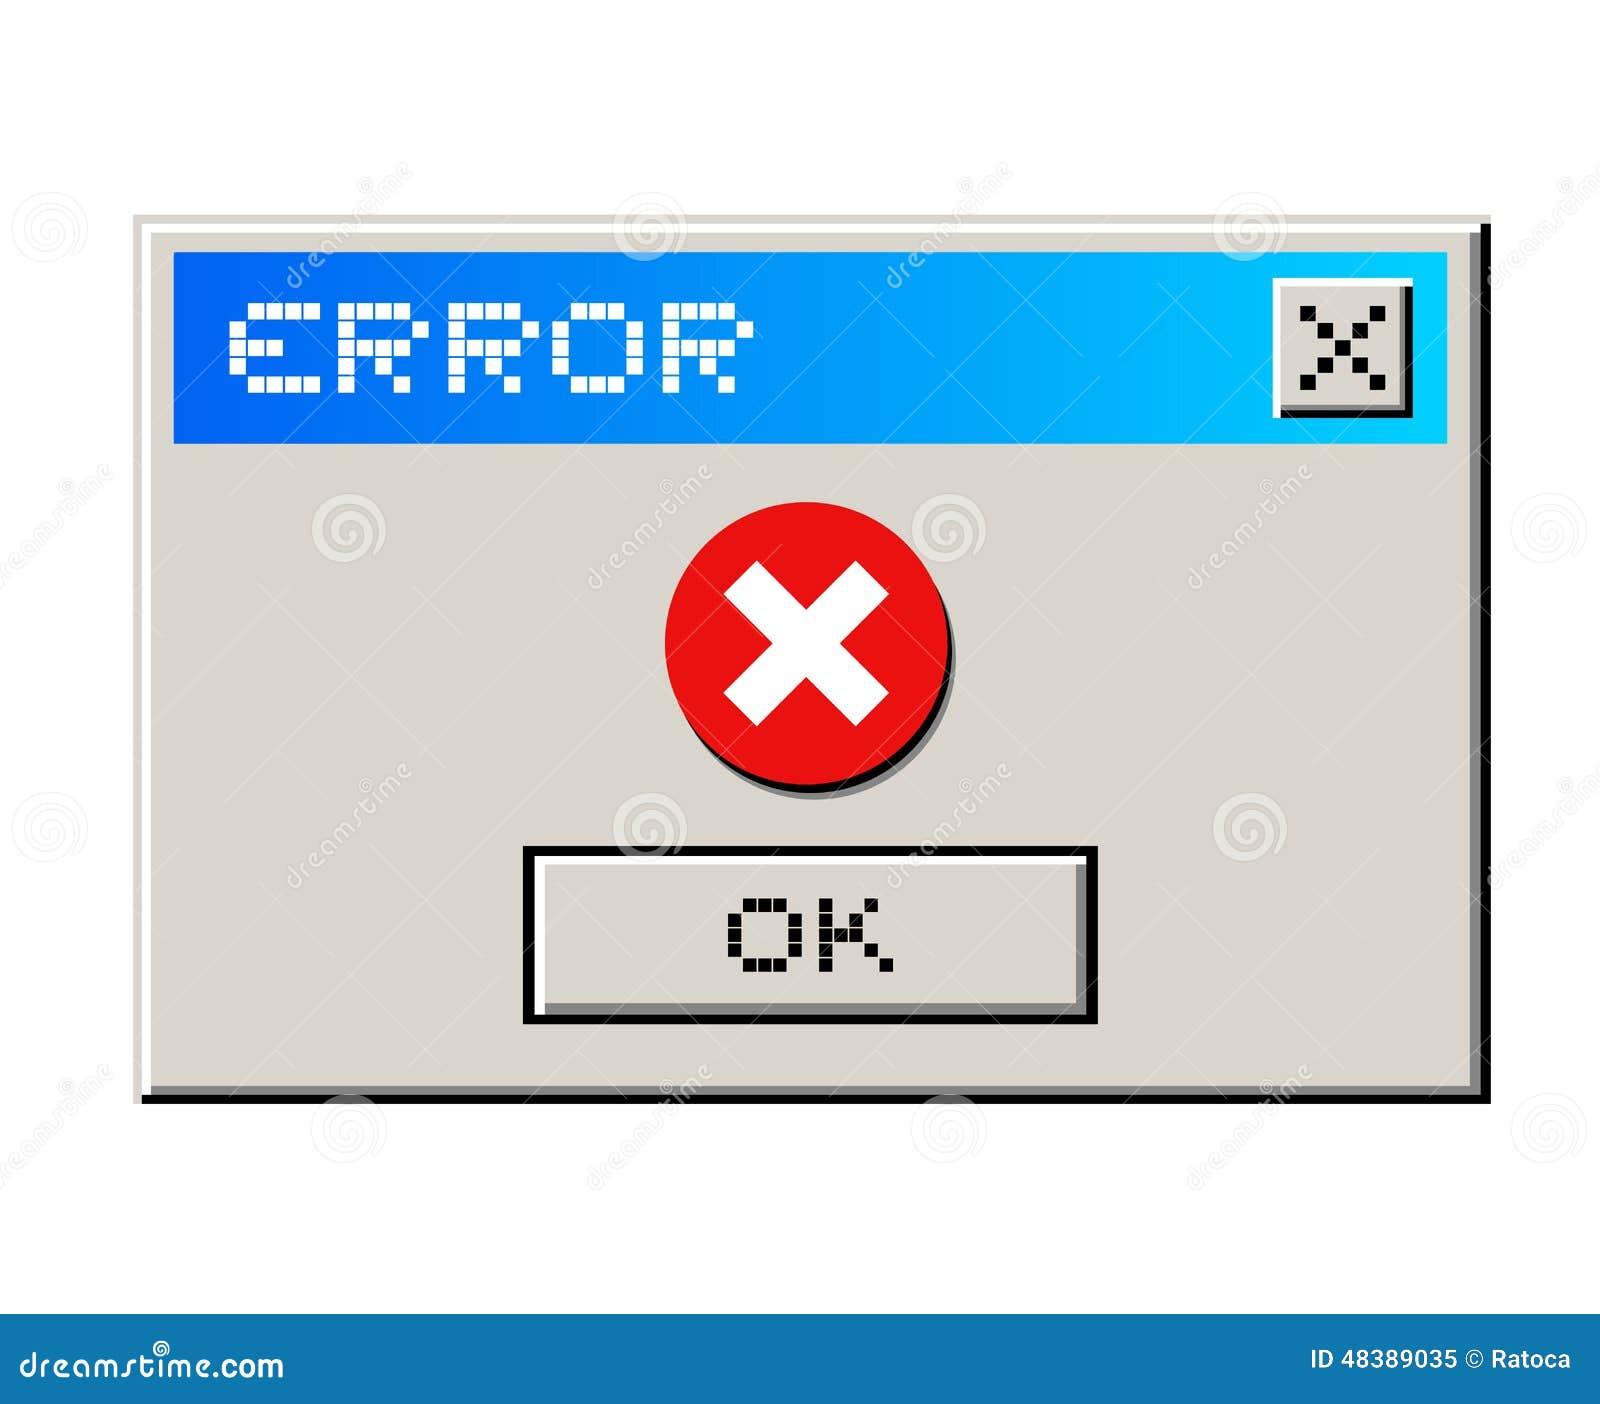 error message stock vector image 48389035 free clip art thumbs up small free clip art thumbs up brown